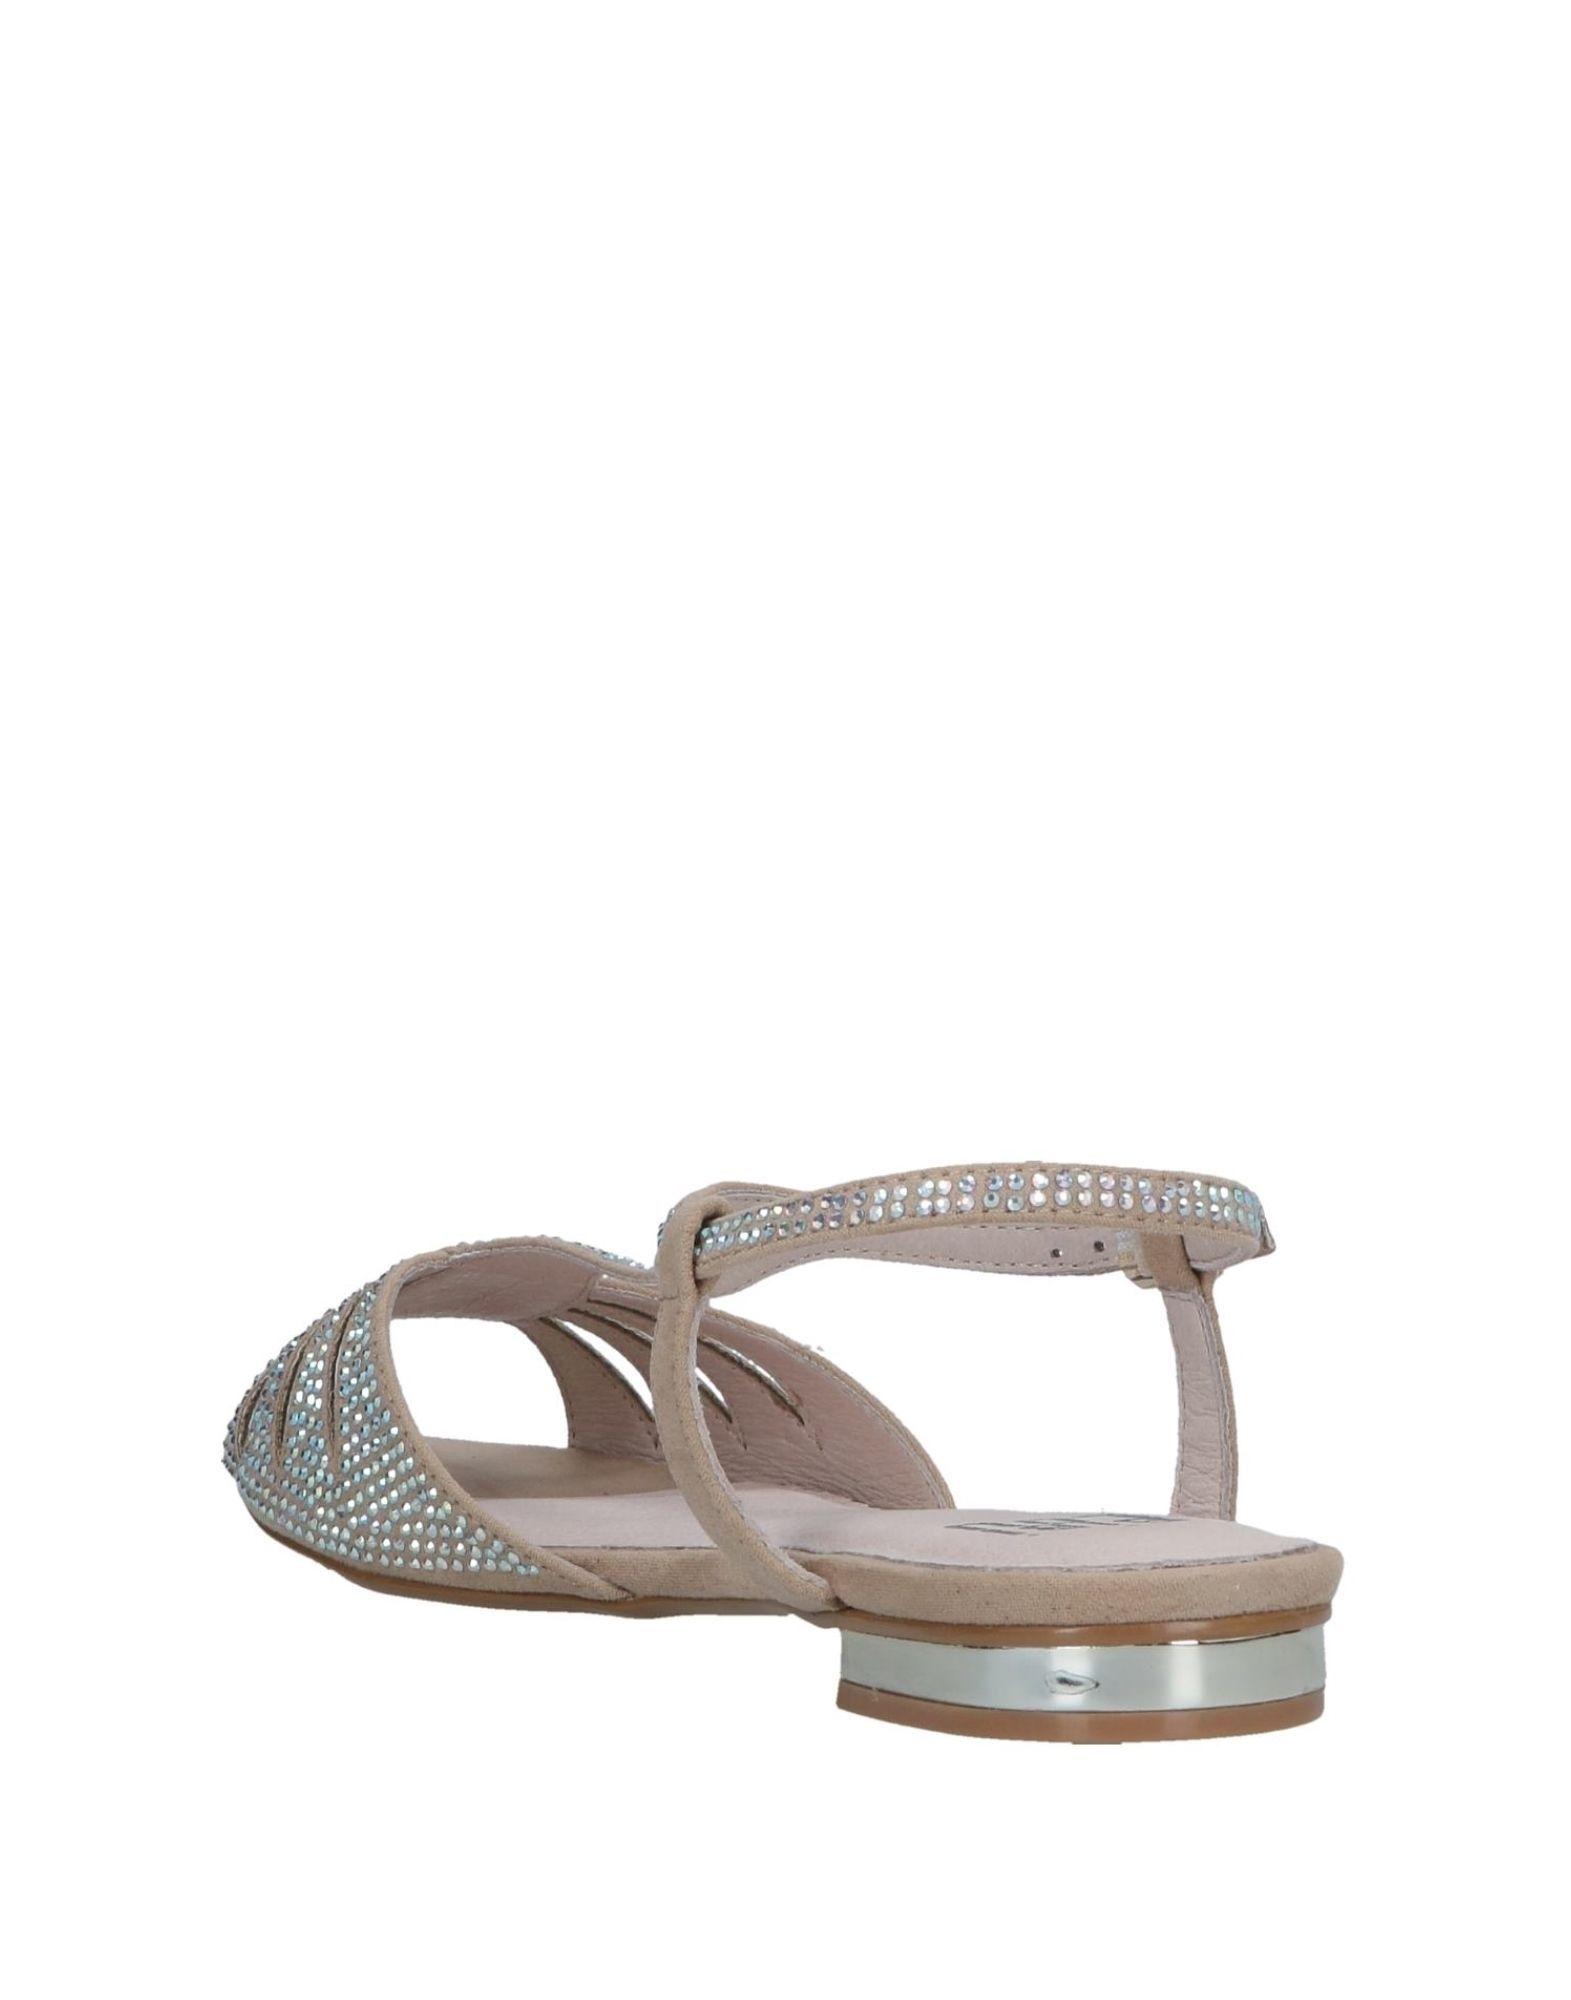 Bibi Lou Khaki Sandals